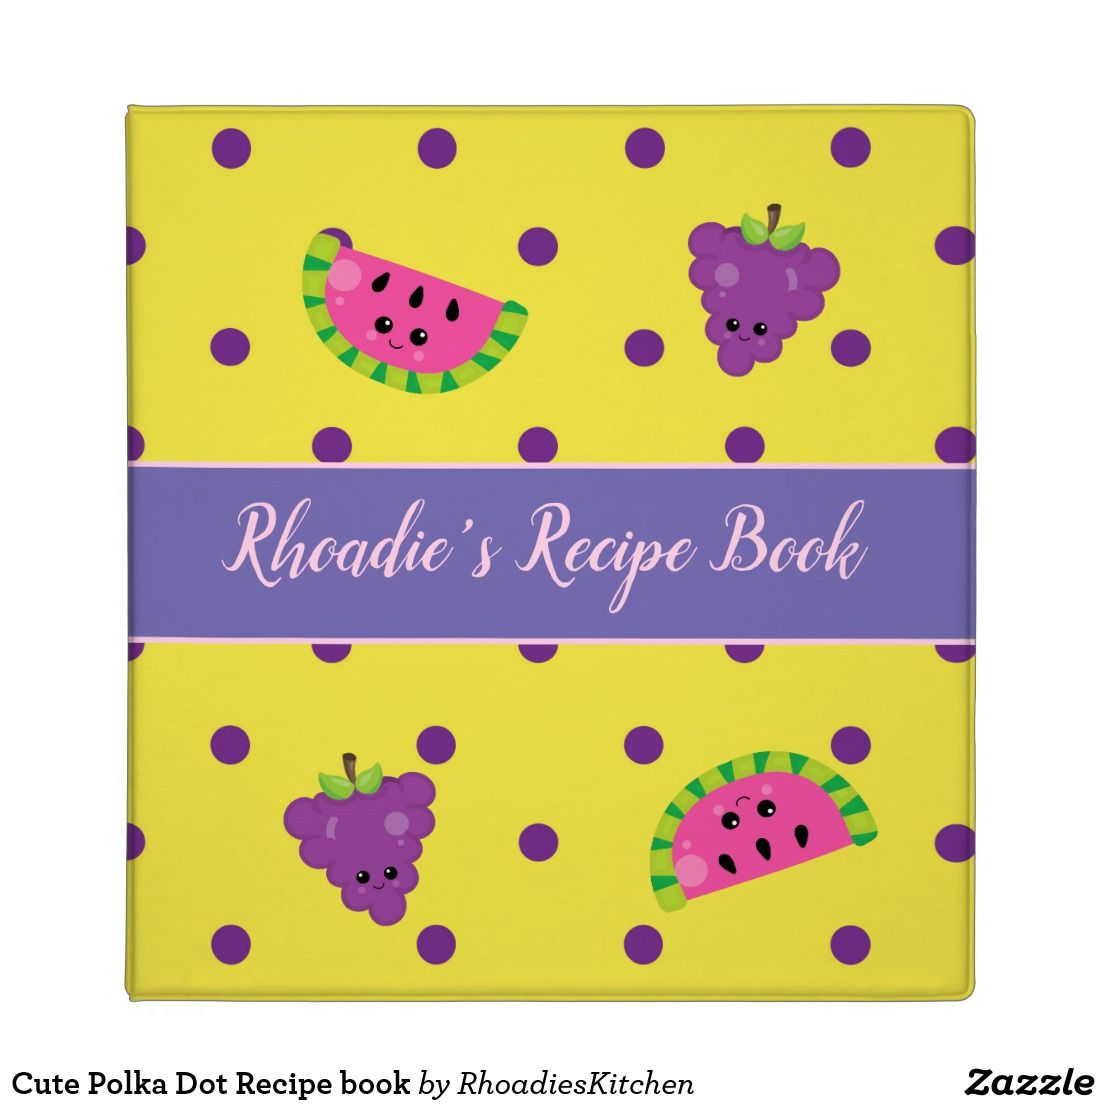 Cute Polka Dot Recipe Book 3 Ring Binder Zazzle Com Recipe Book Binder Design Polka Dots